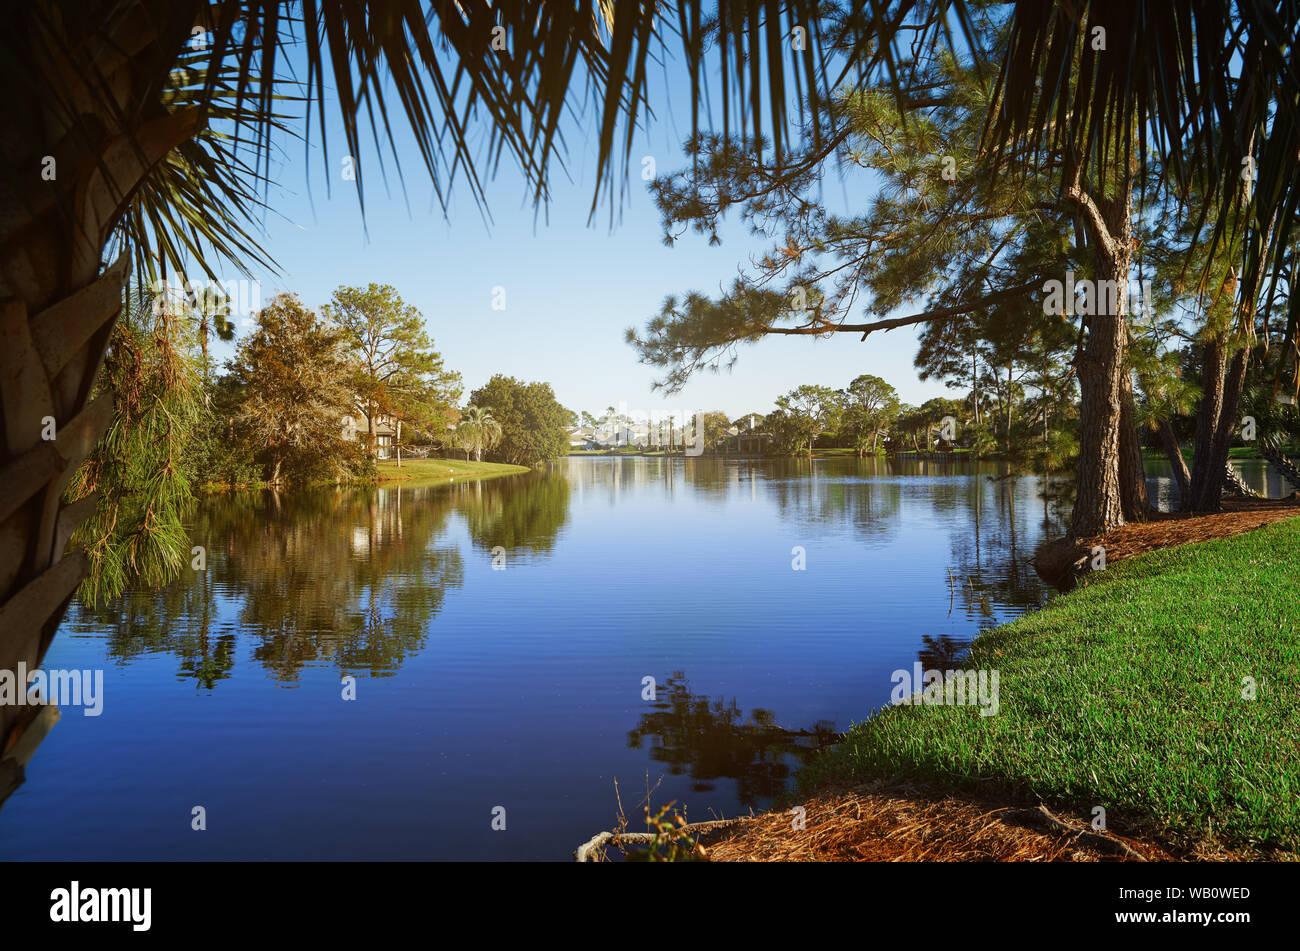 Small lake in Florida, USA Stock Photo